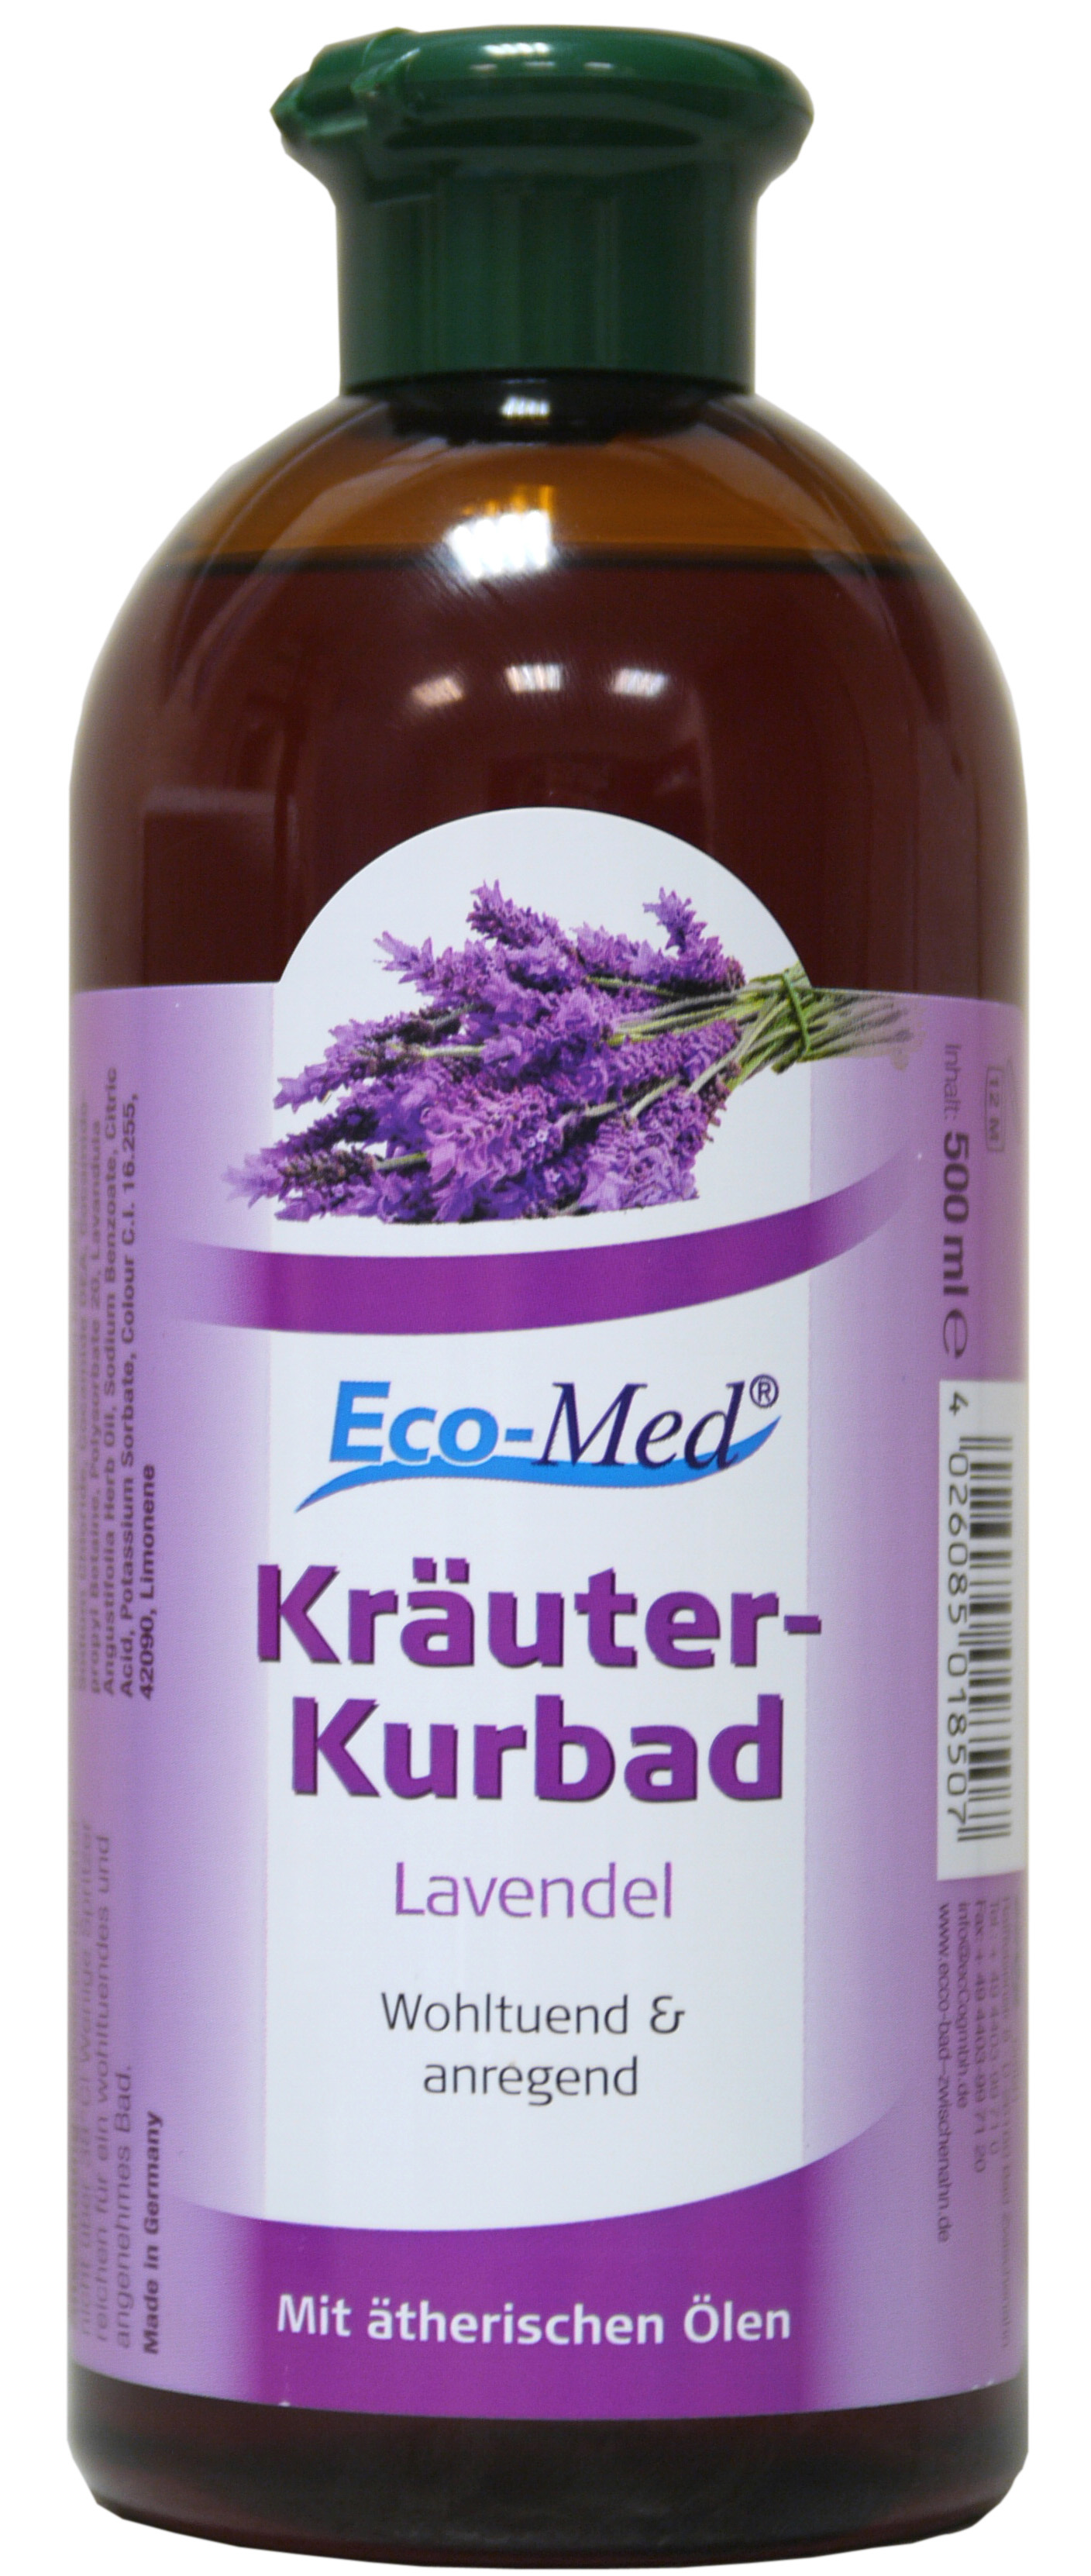 01850 - herbal essences bath lavender 500 ml